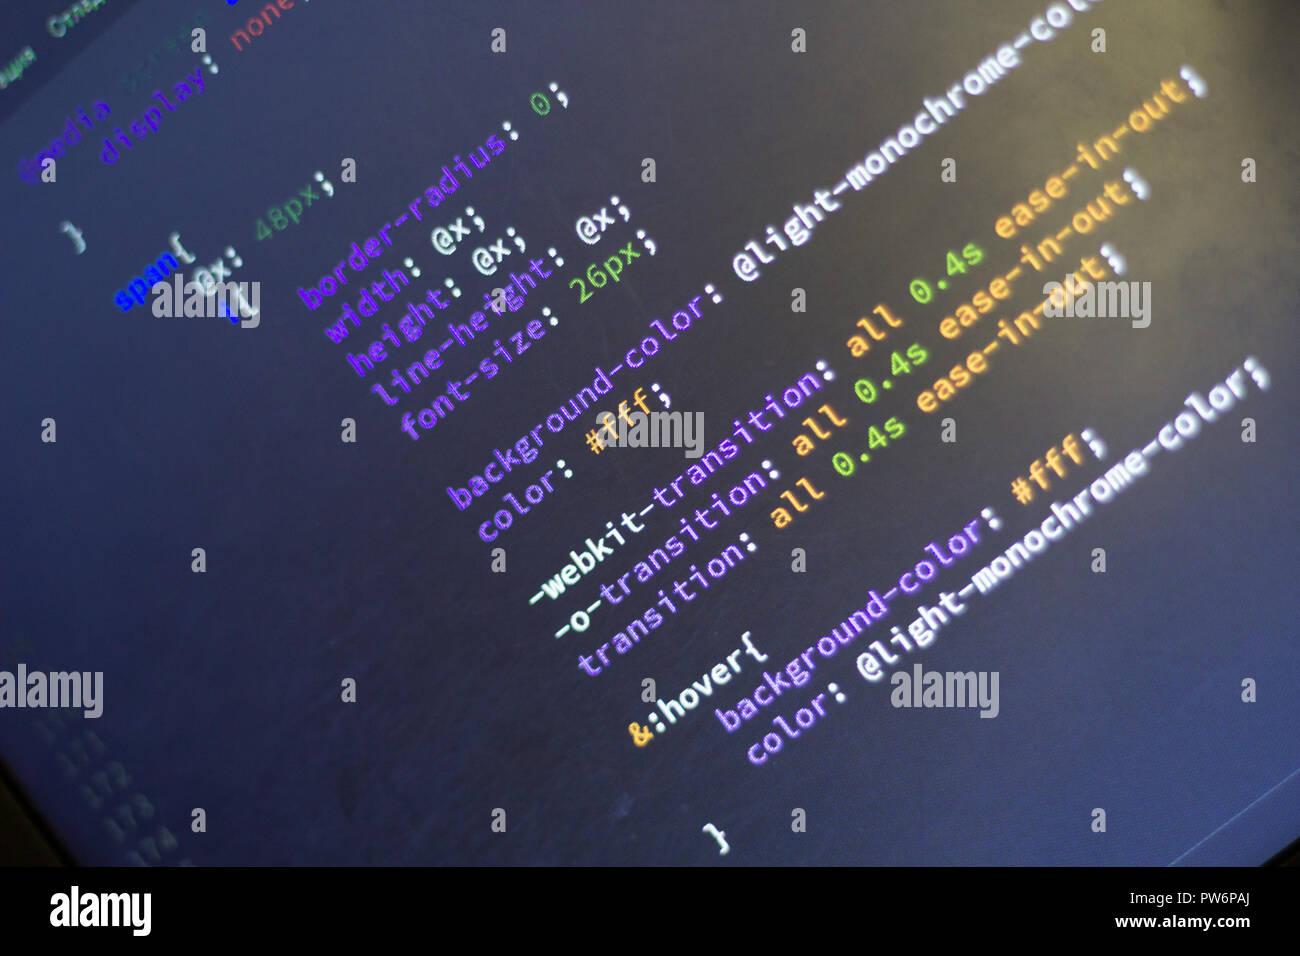 Web development code: CSS/LESS styles preprocessor script